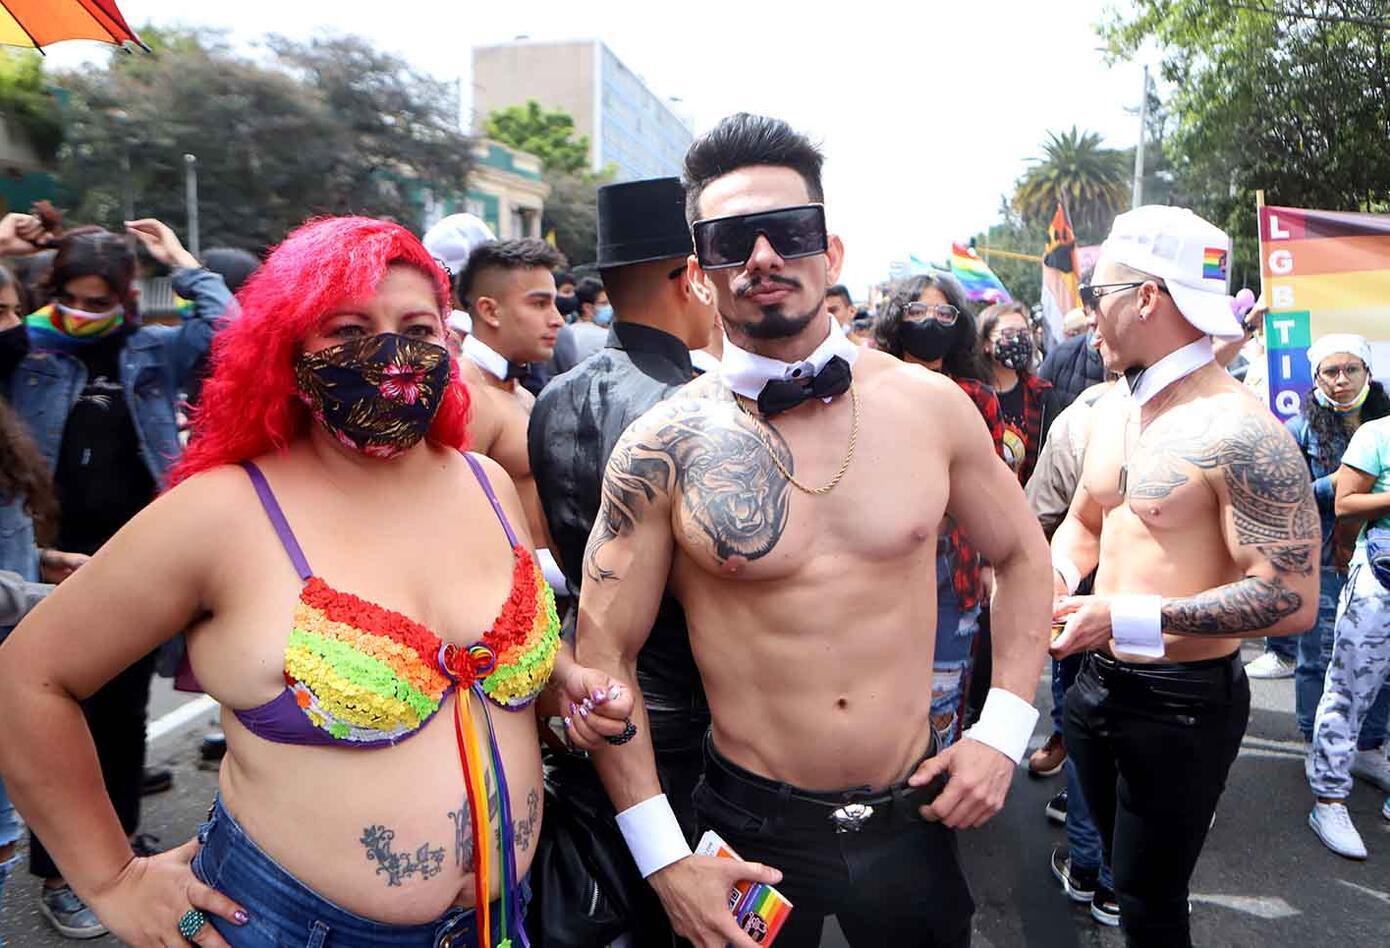 Así se vivió la marcha del Orgullo LQTBI+ en Bogotá   RCN Radio